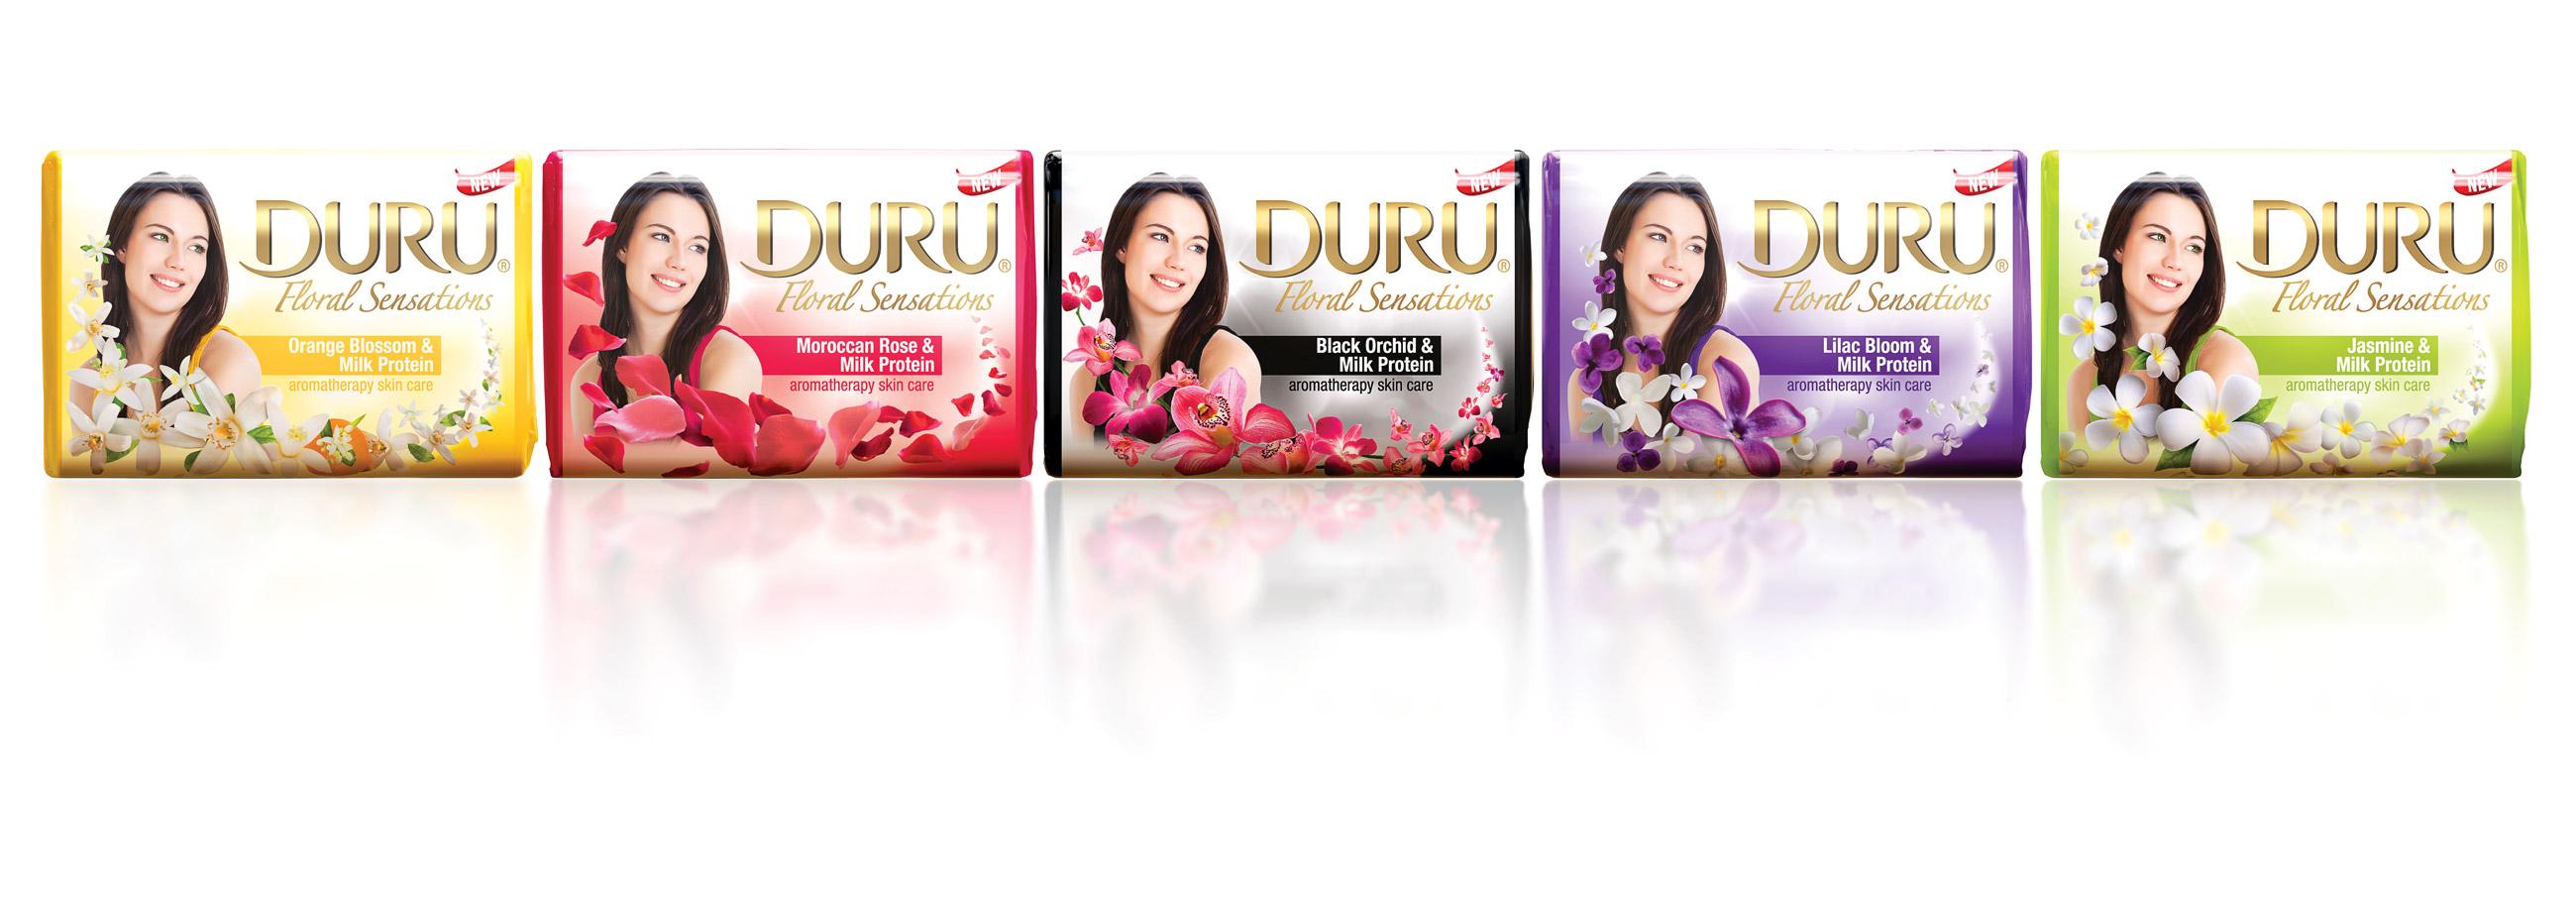 DURU_FloralSensation_02